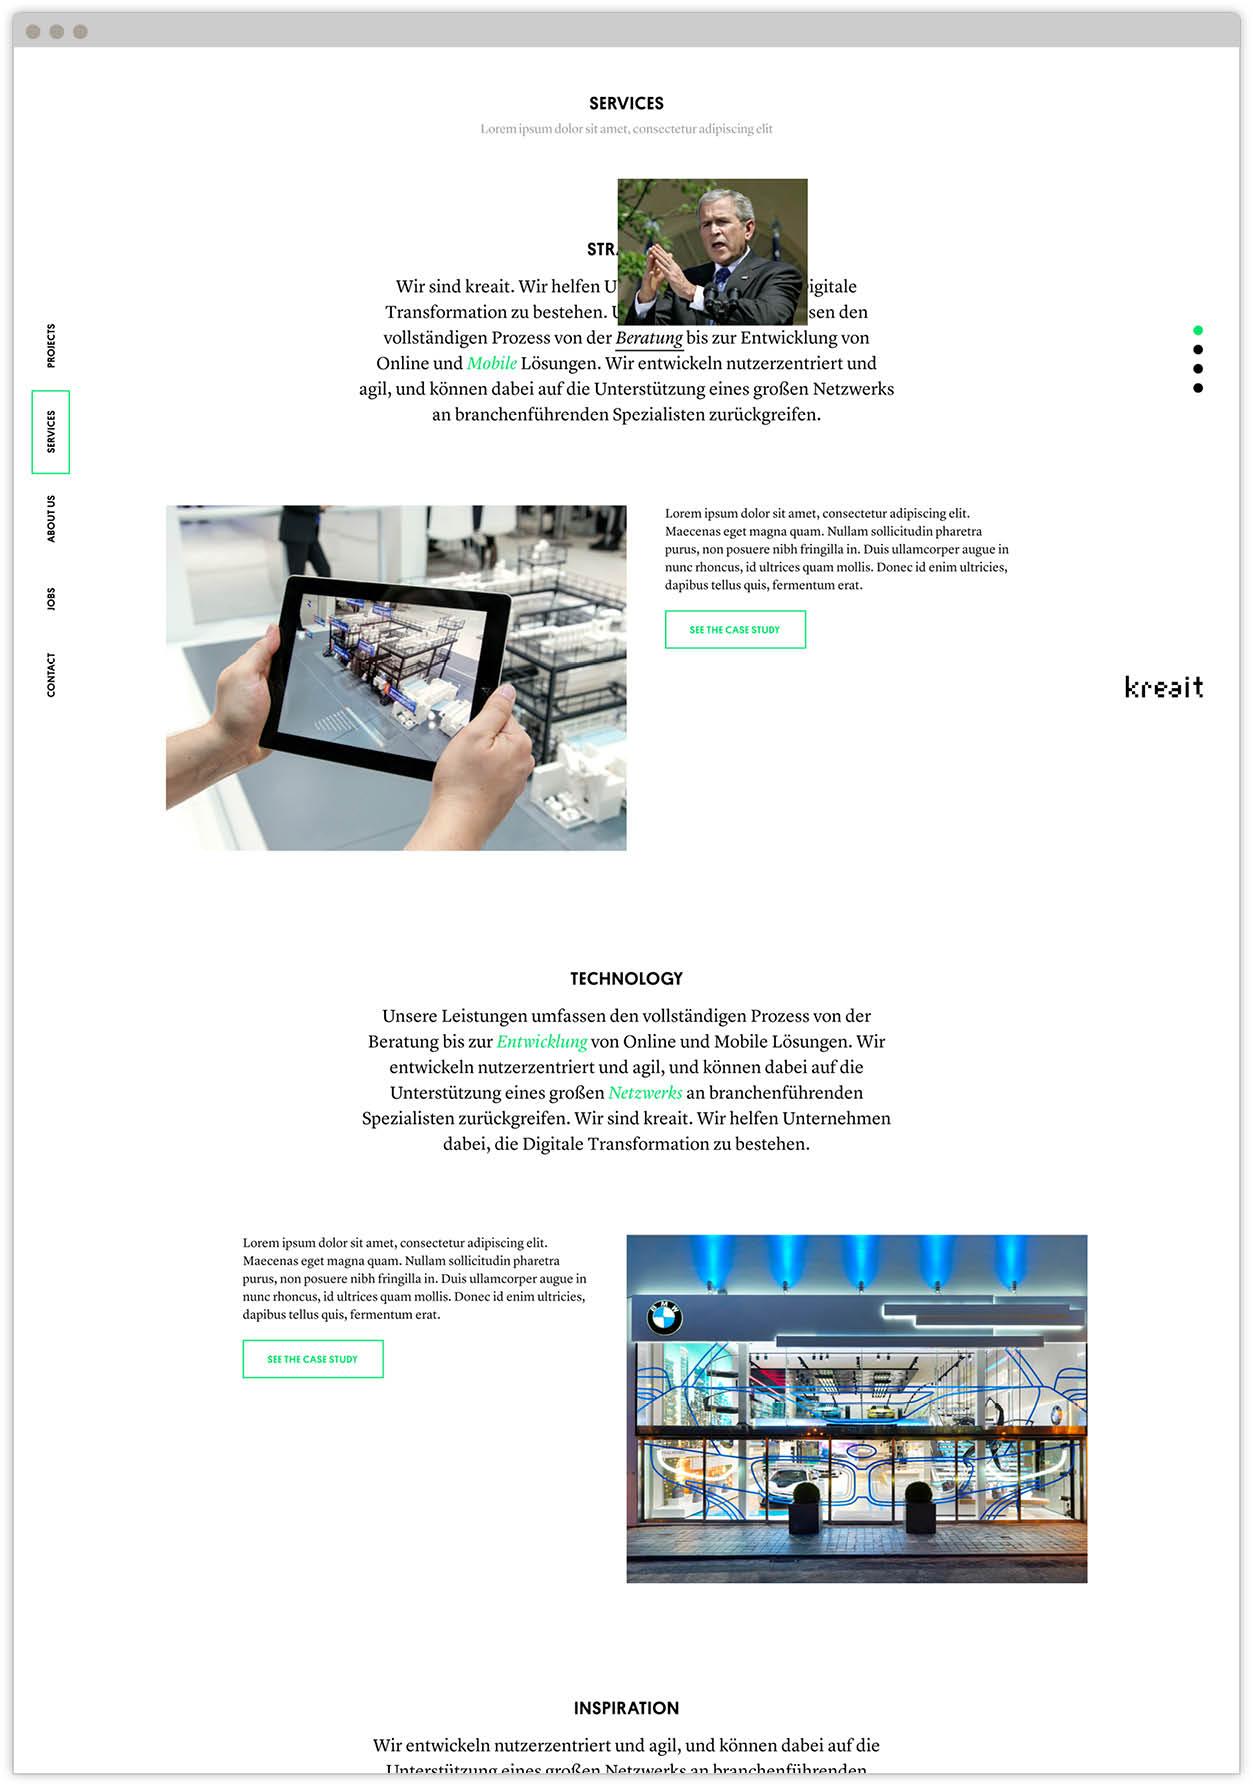 08_minigram_Website_kreait_web